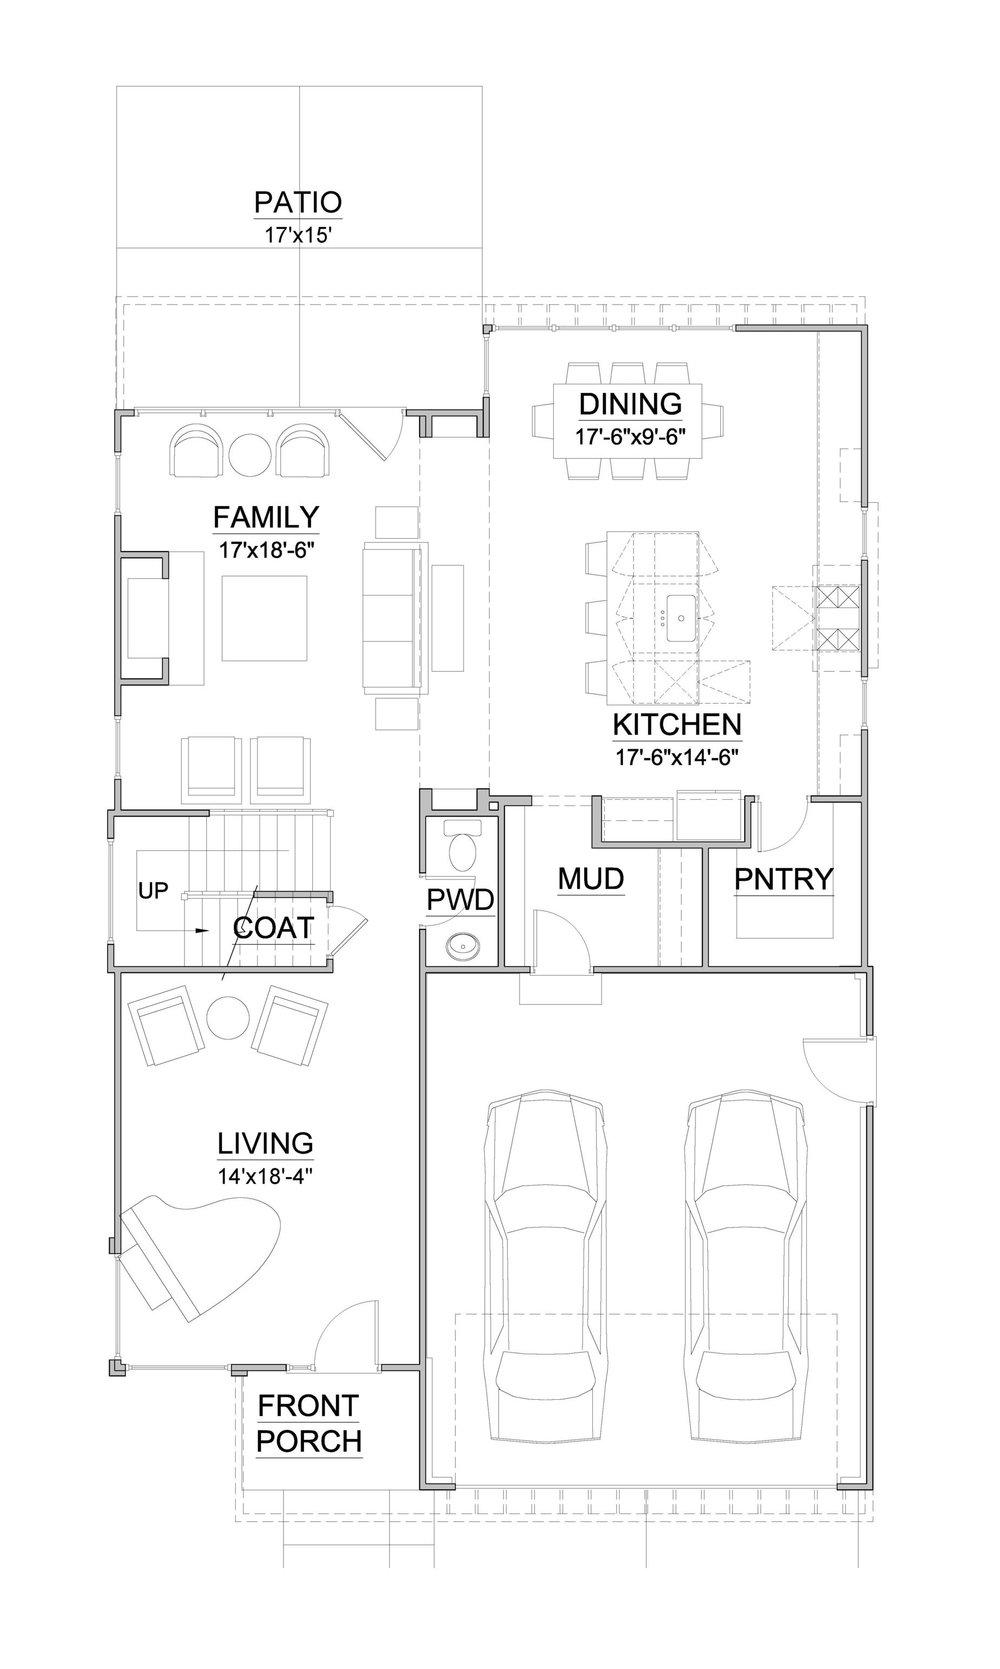 Lomax_First Floor_24x36.jpg